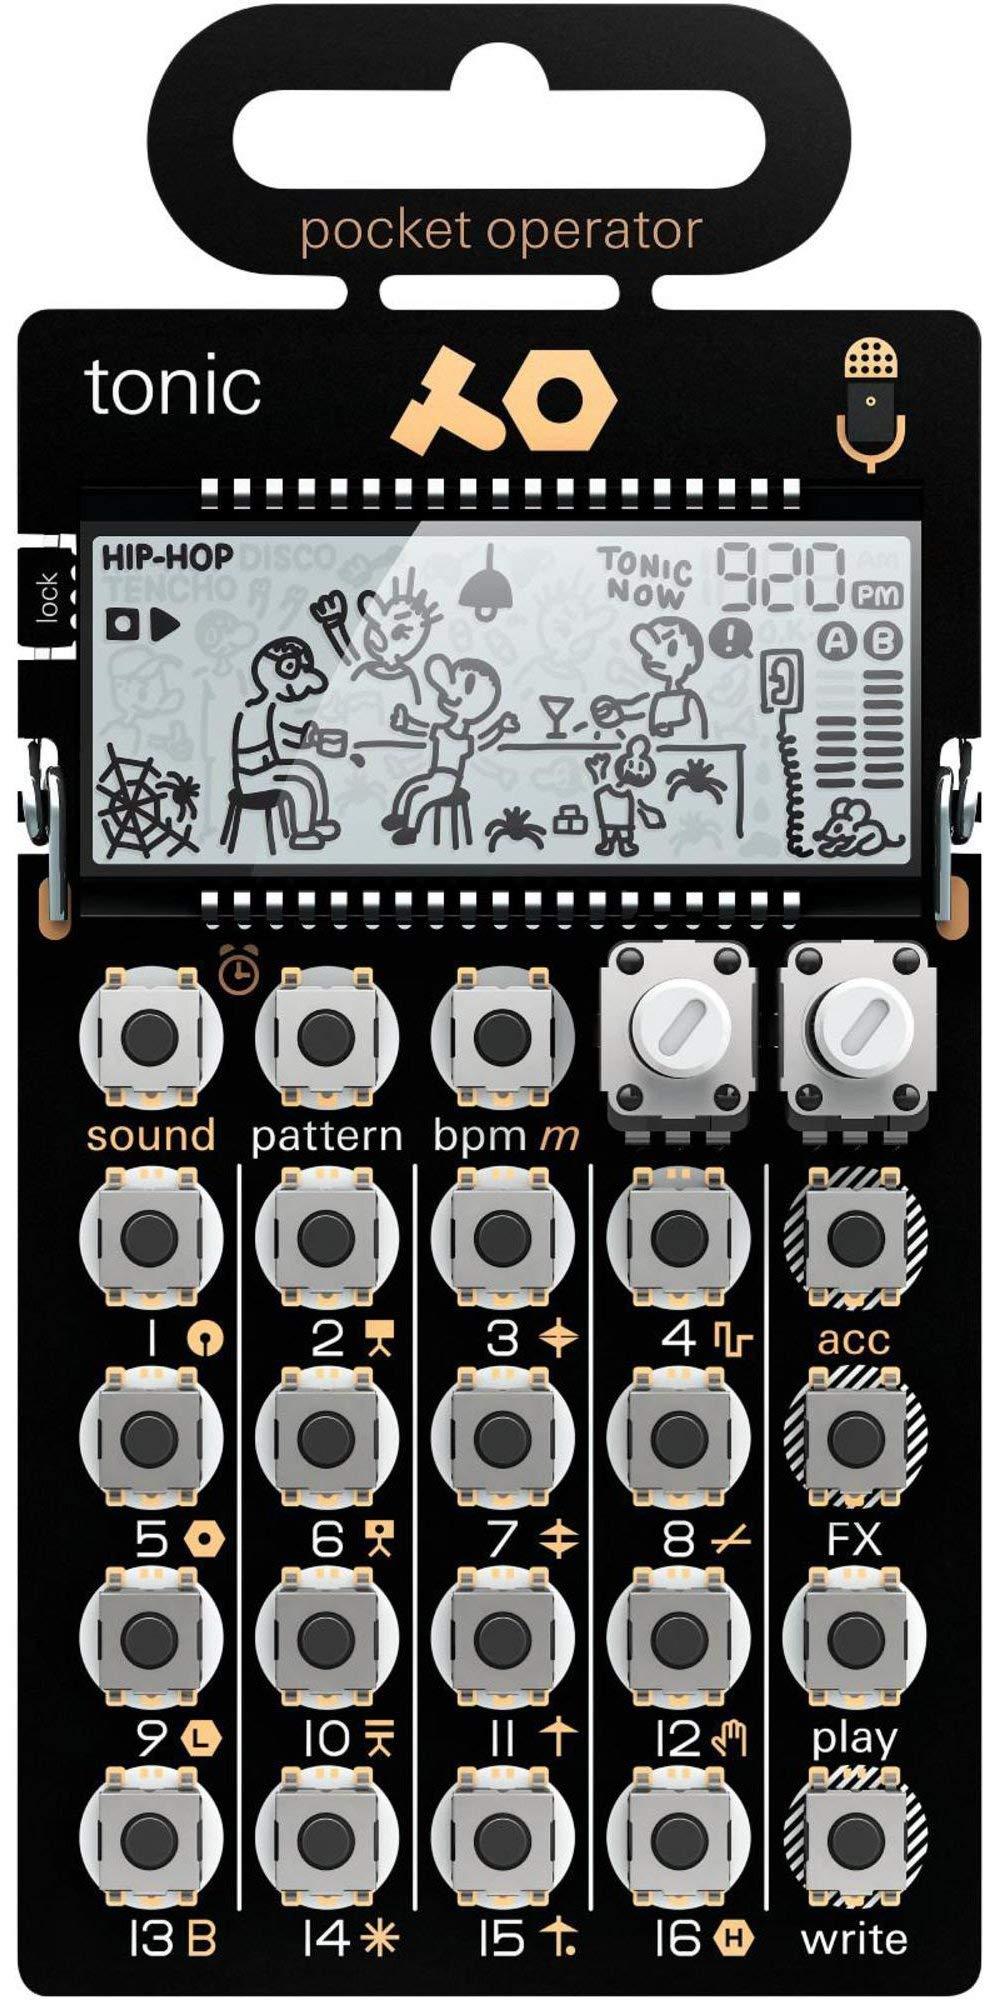 Teenage Engineering Pocket Operator PO-32 tonic Black (Certified Refurbished) by Teenage Engineering (Image #1)